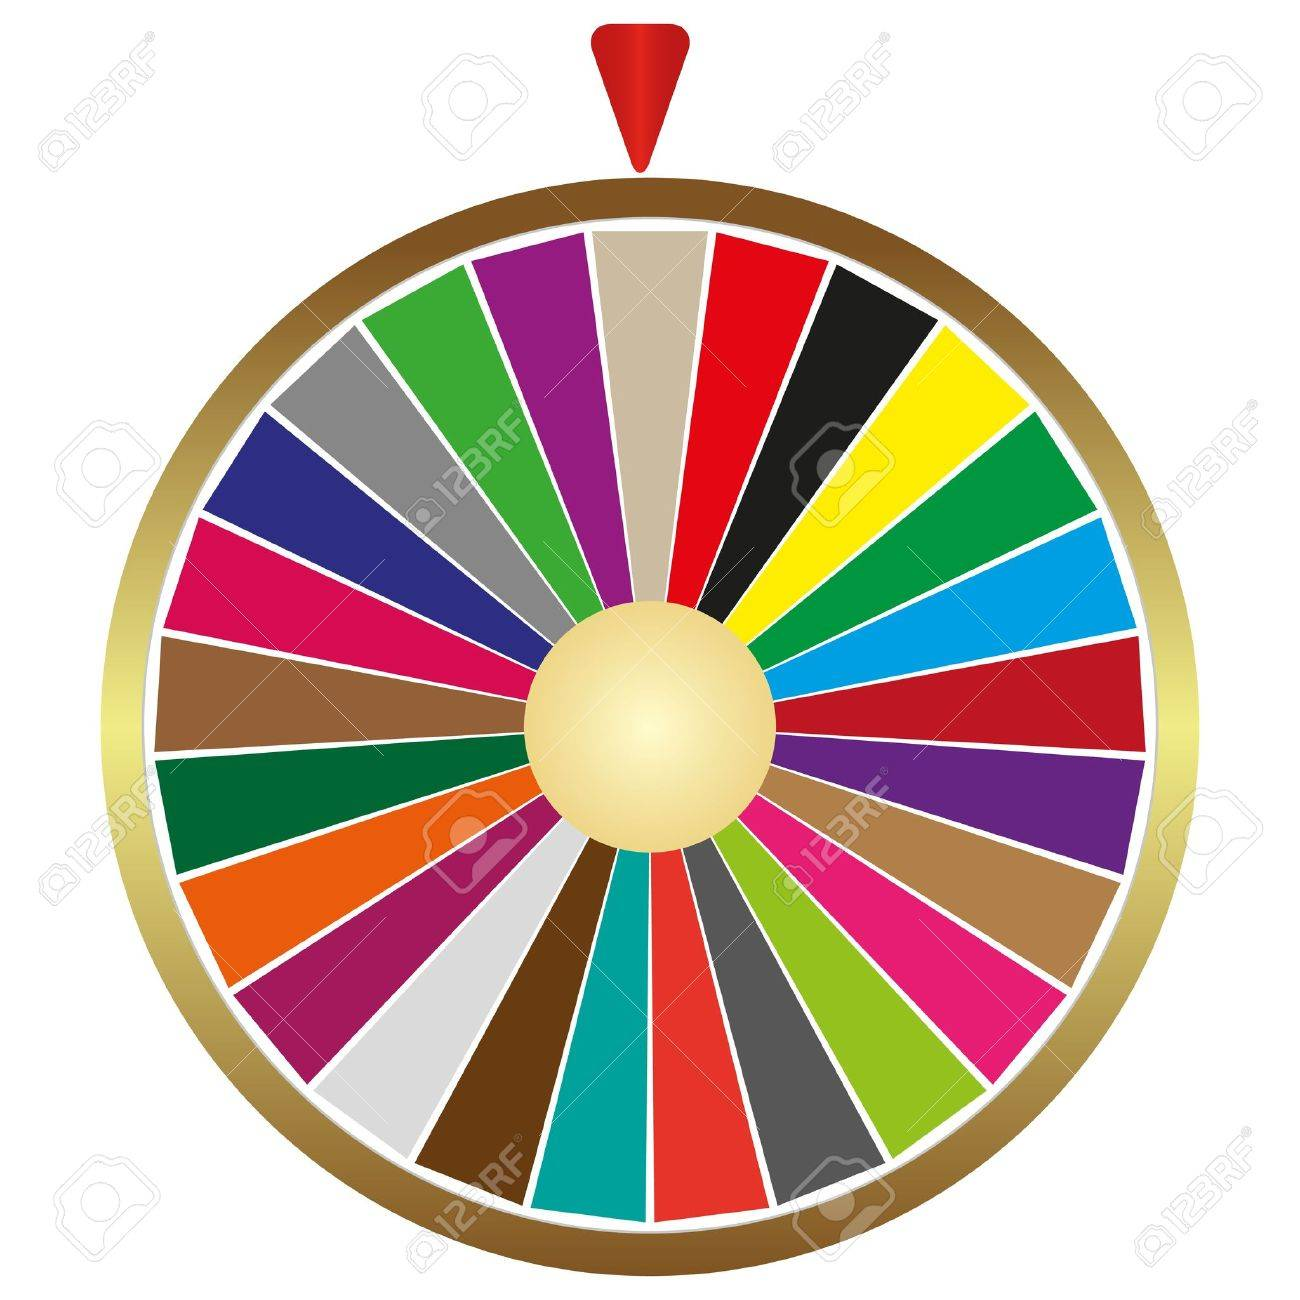 Wheel of fortune - 16718121